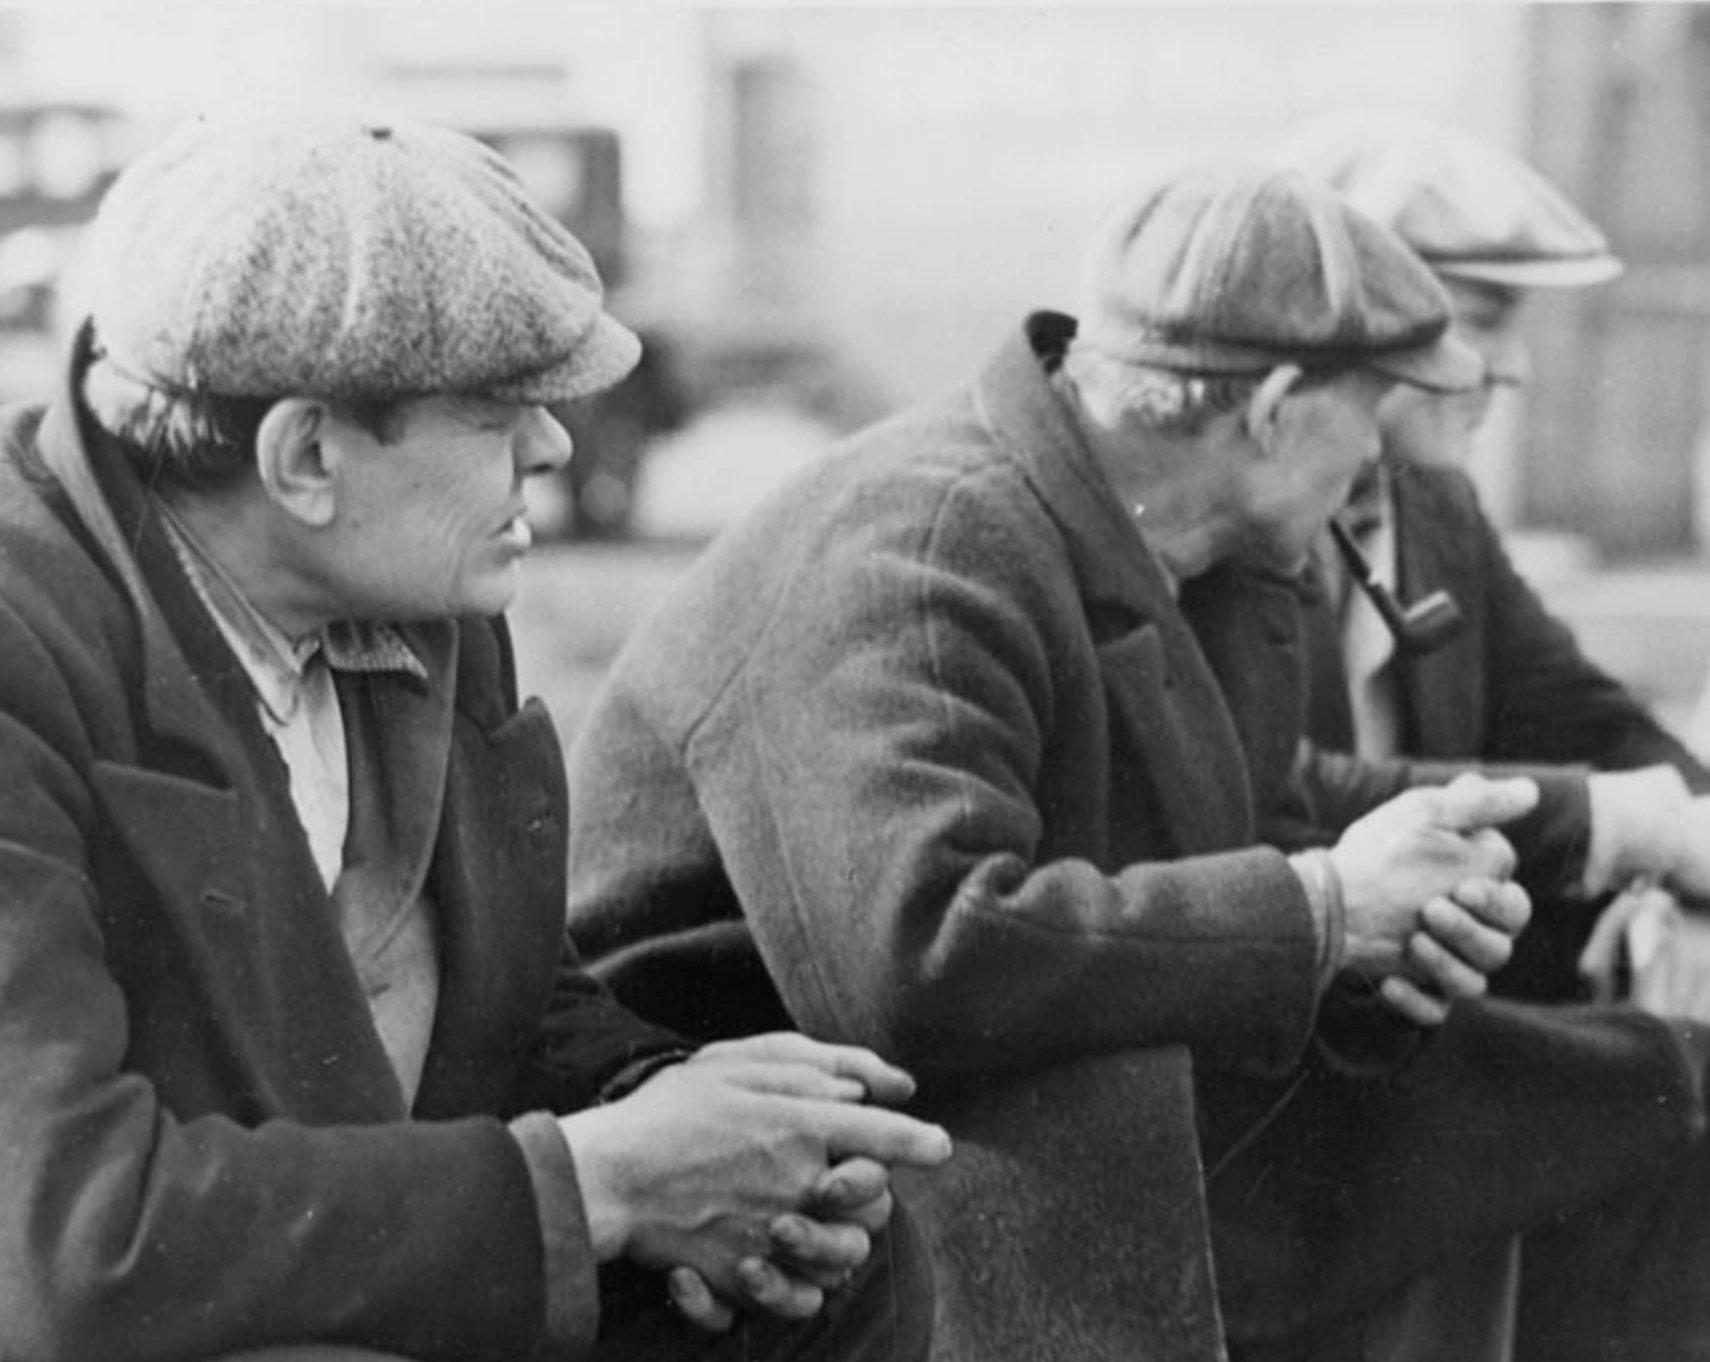 Casquette gavroche - Histoire - Ouvriers Workwear